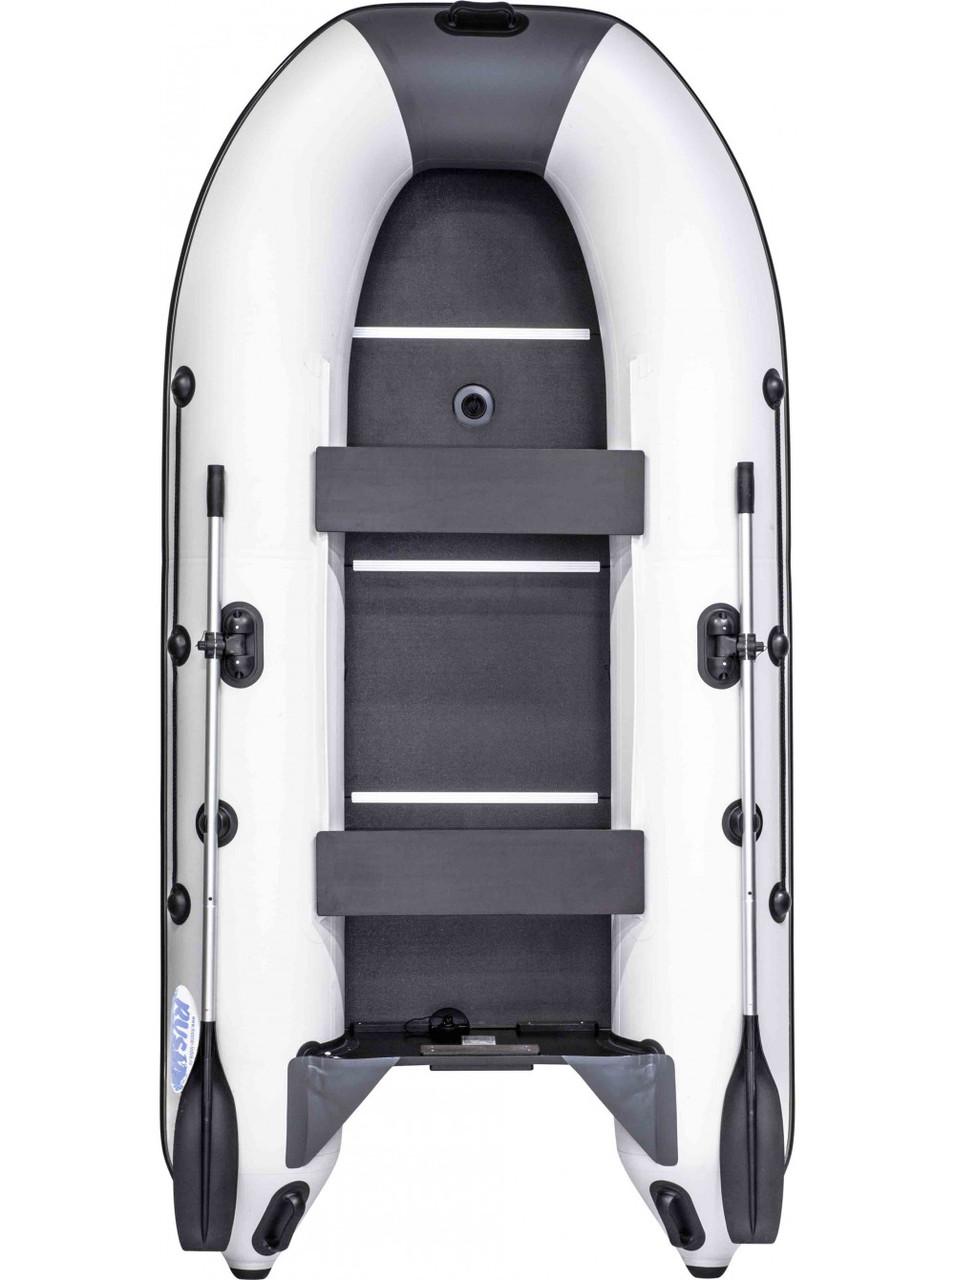 Лодка RUSH 3000 СК комби светло-серый/графит